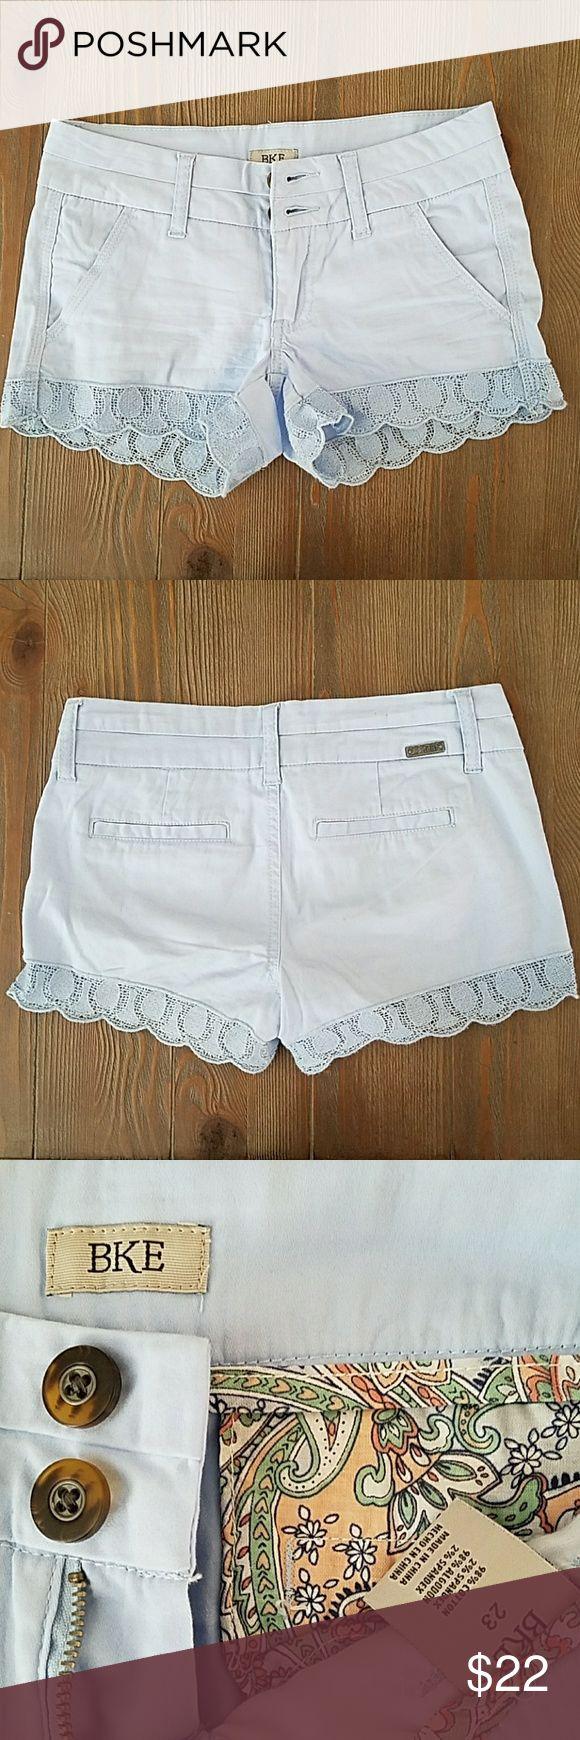 "BKE twill lace hem shorts Adorable sky blue BKE lace hem twill shorts.  Double button closure and flat back pockets. 3"" length.  Worn once. BKE Shorts Jean Shorts"